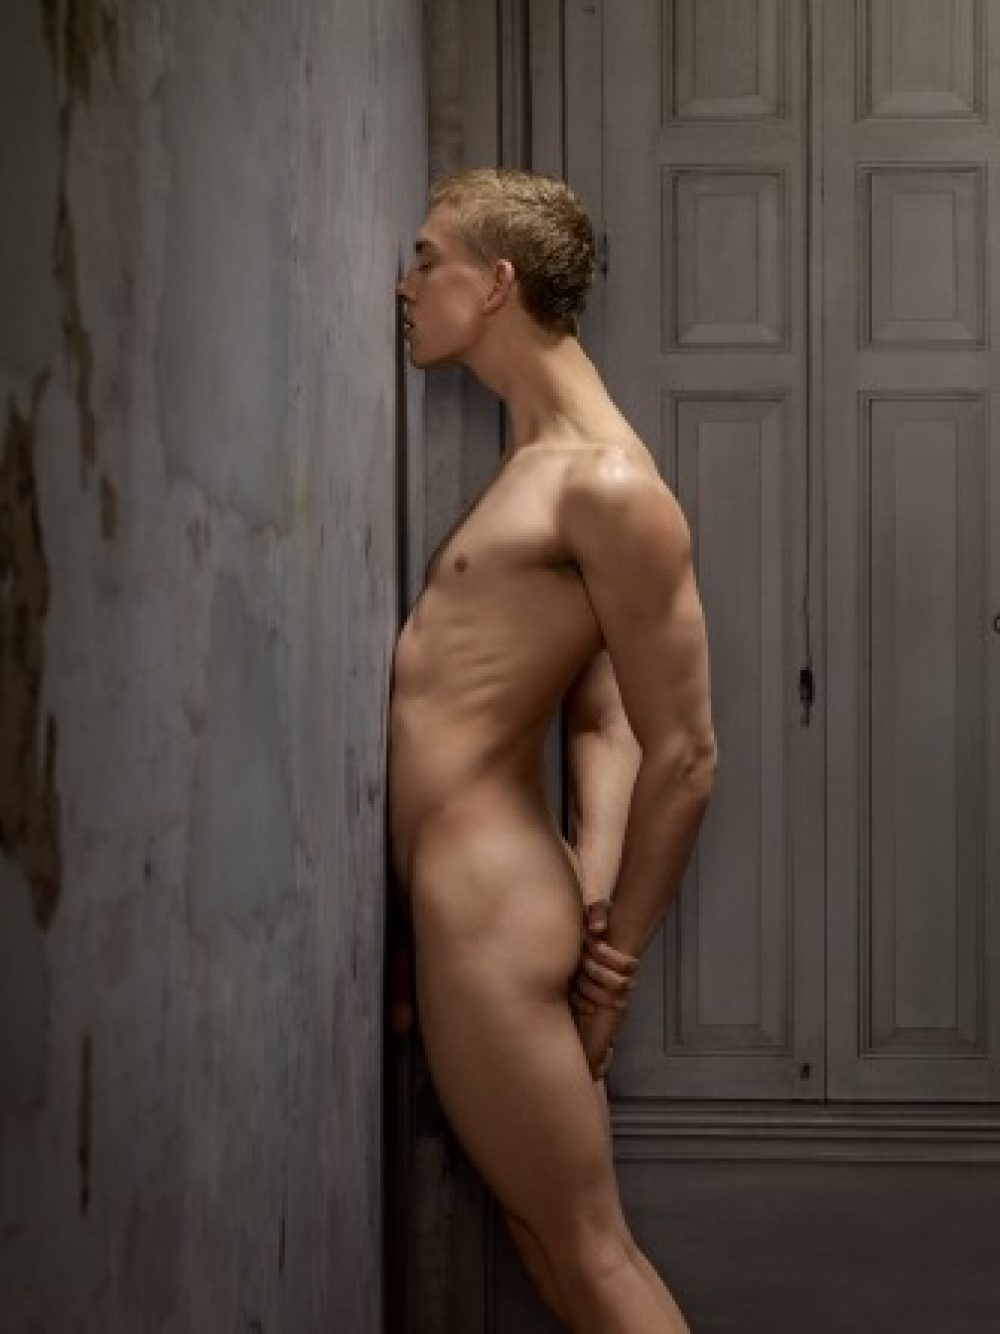 Skin Deep: Male Nude No. 1 (2015), archival print, 130 x 100 cm, Ed. 7, und 80 x 60 cm, Ed. 10